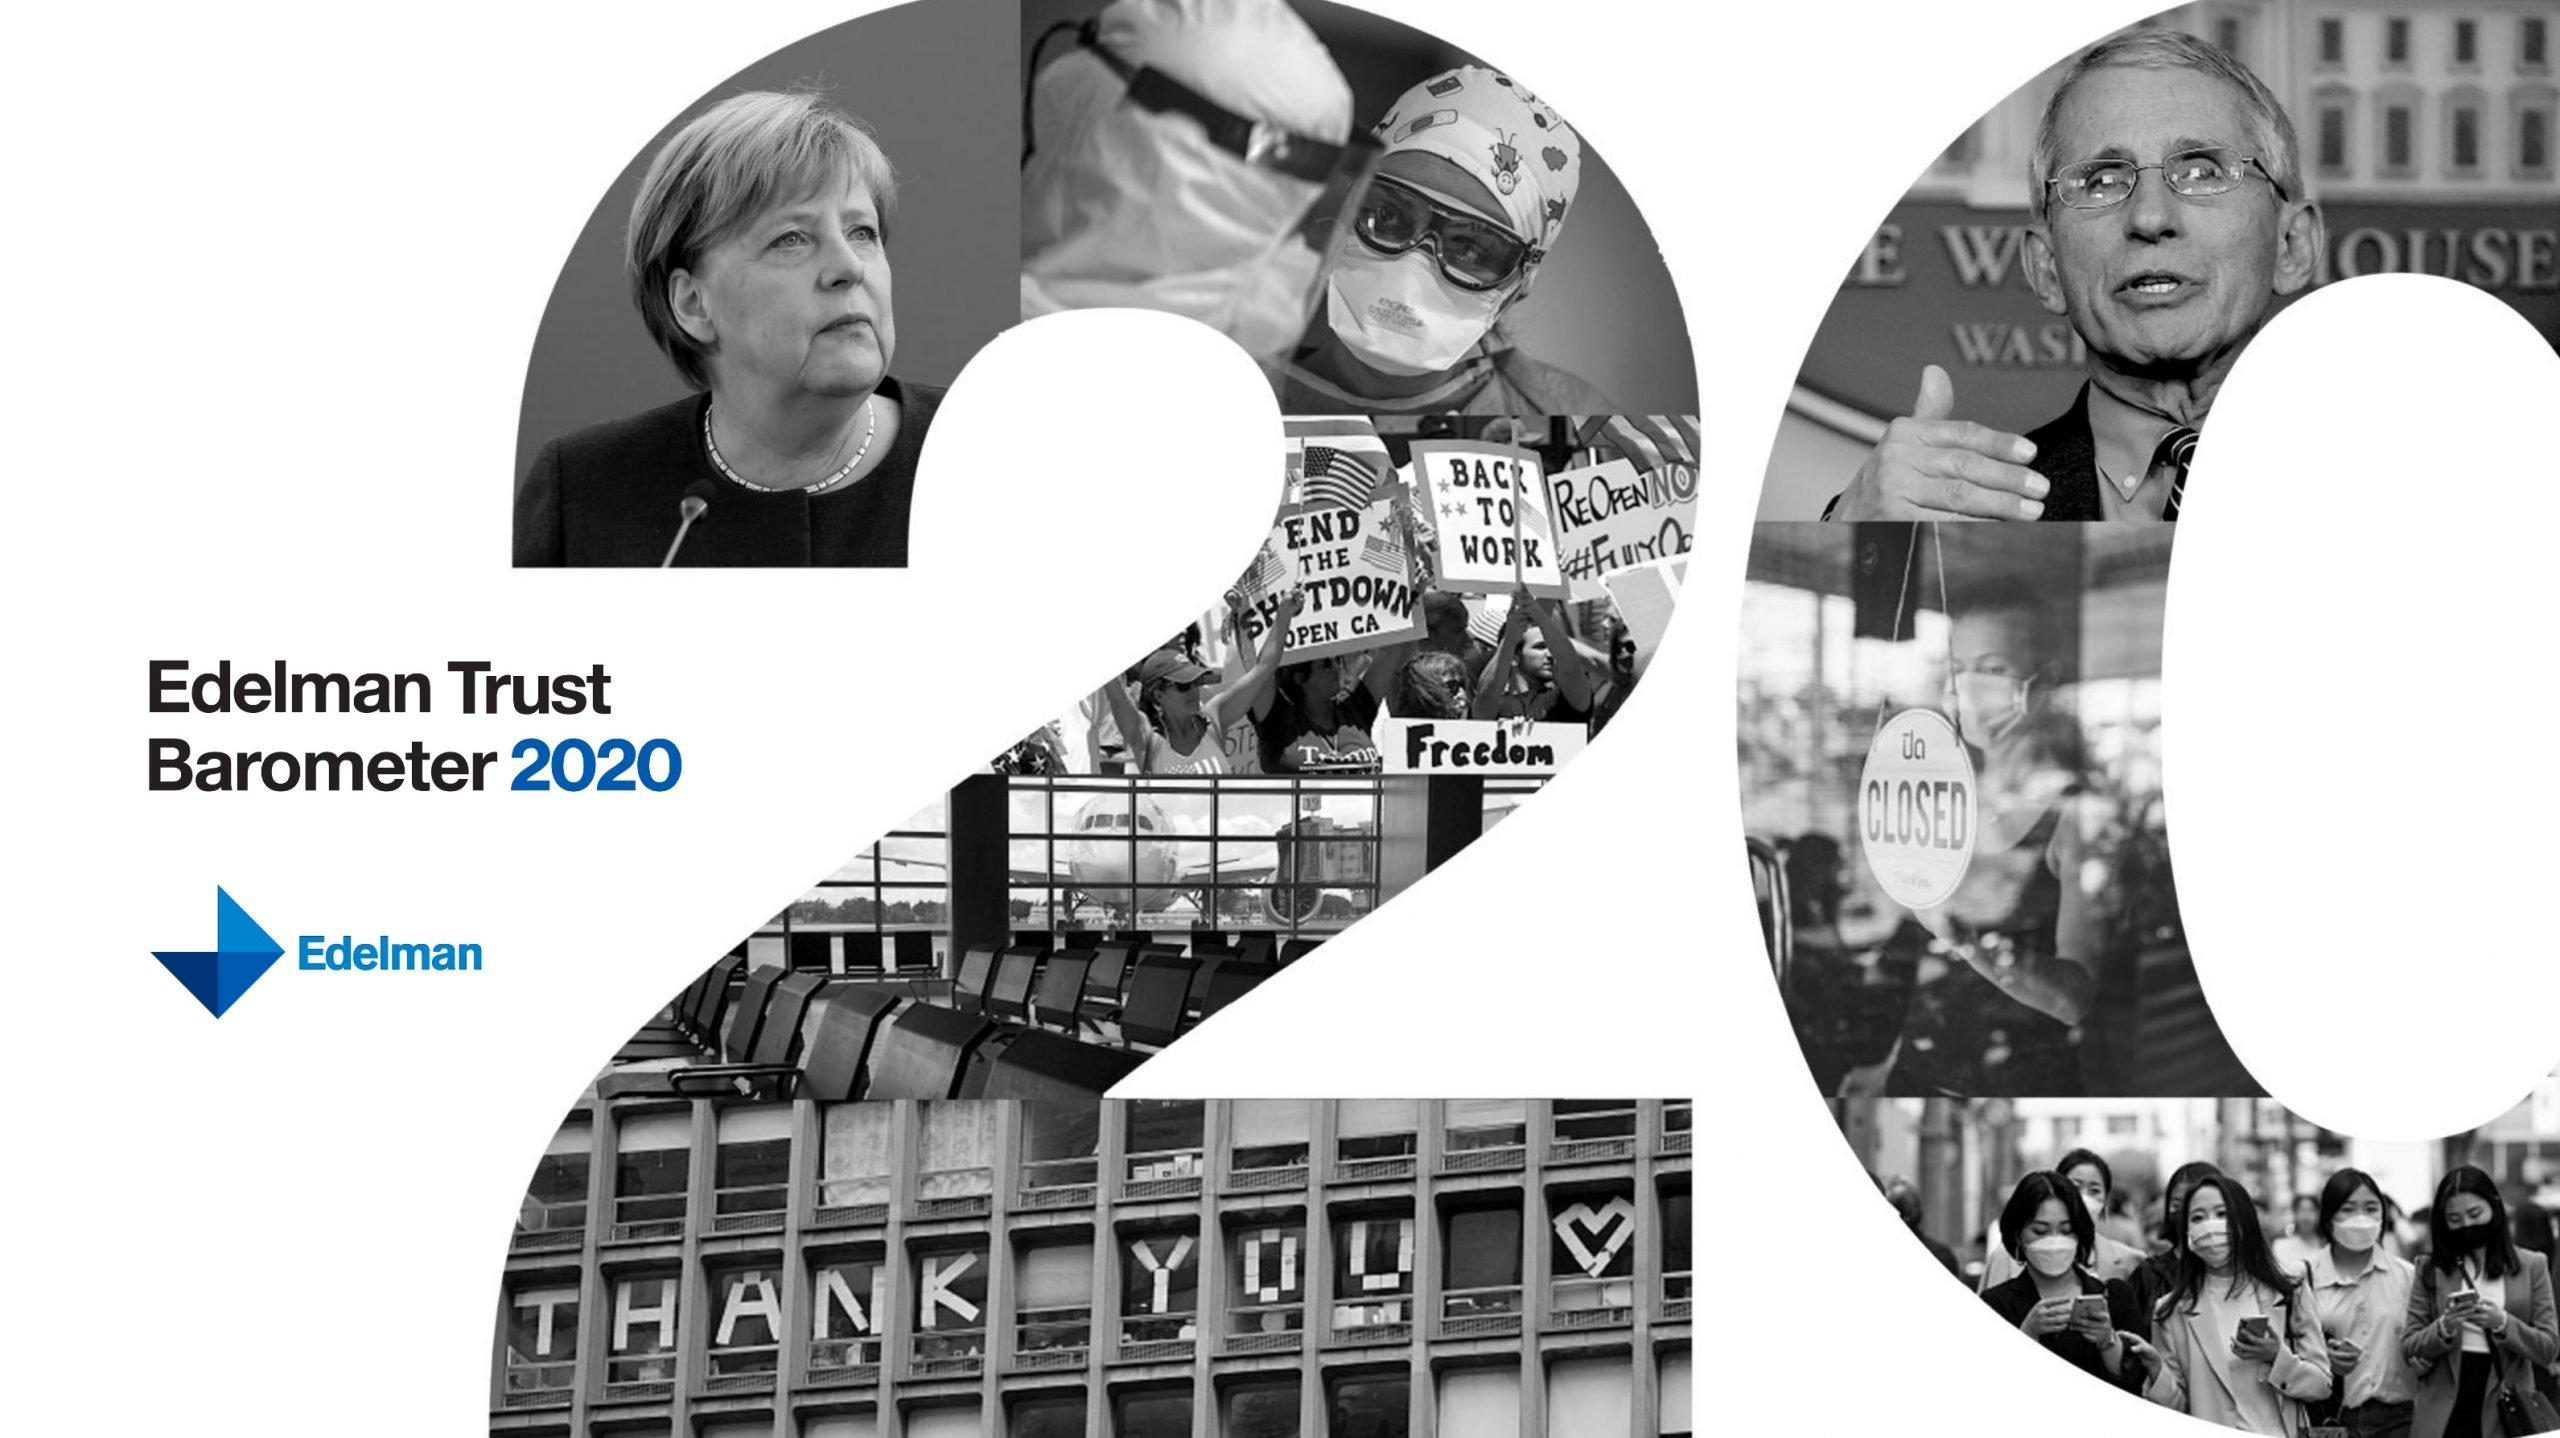 Edelman Trust Barometer 2020